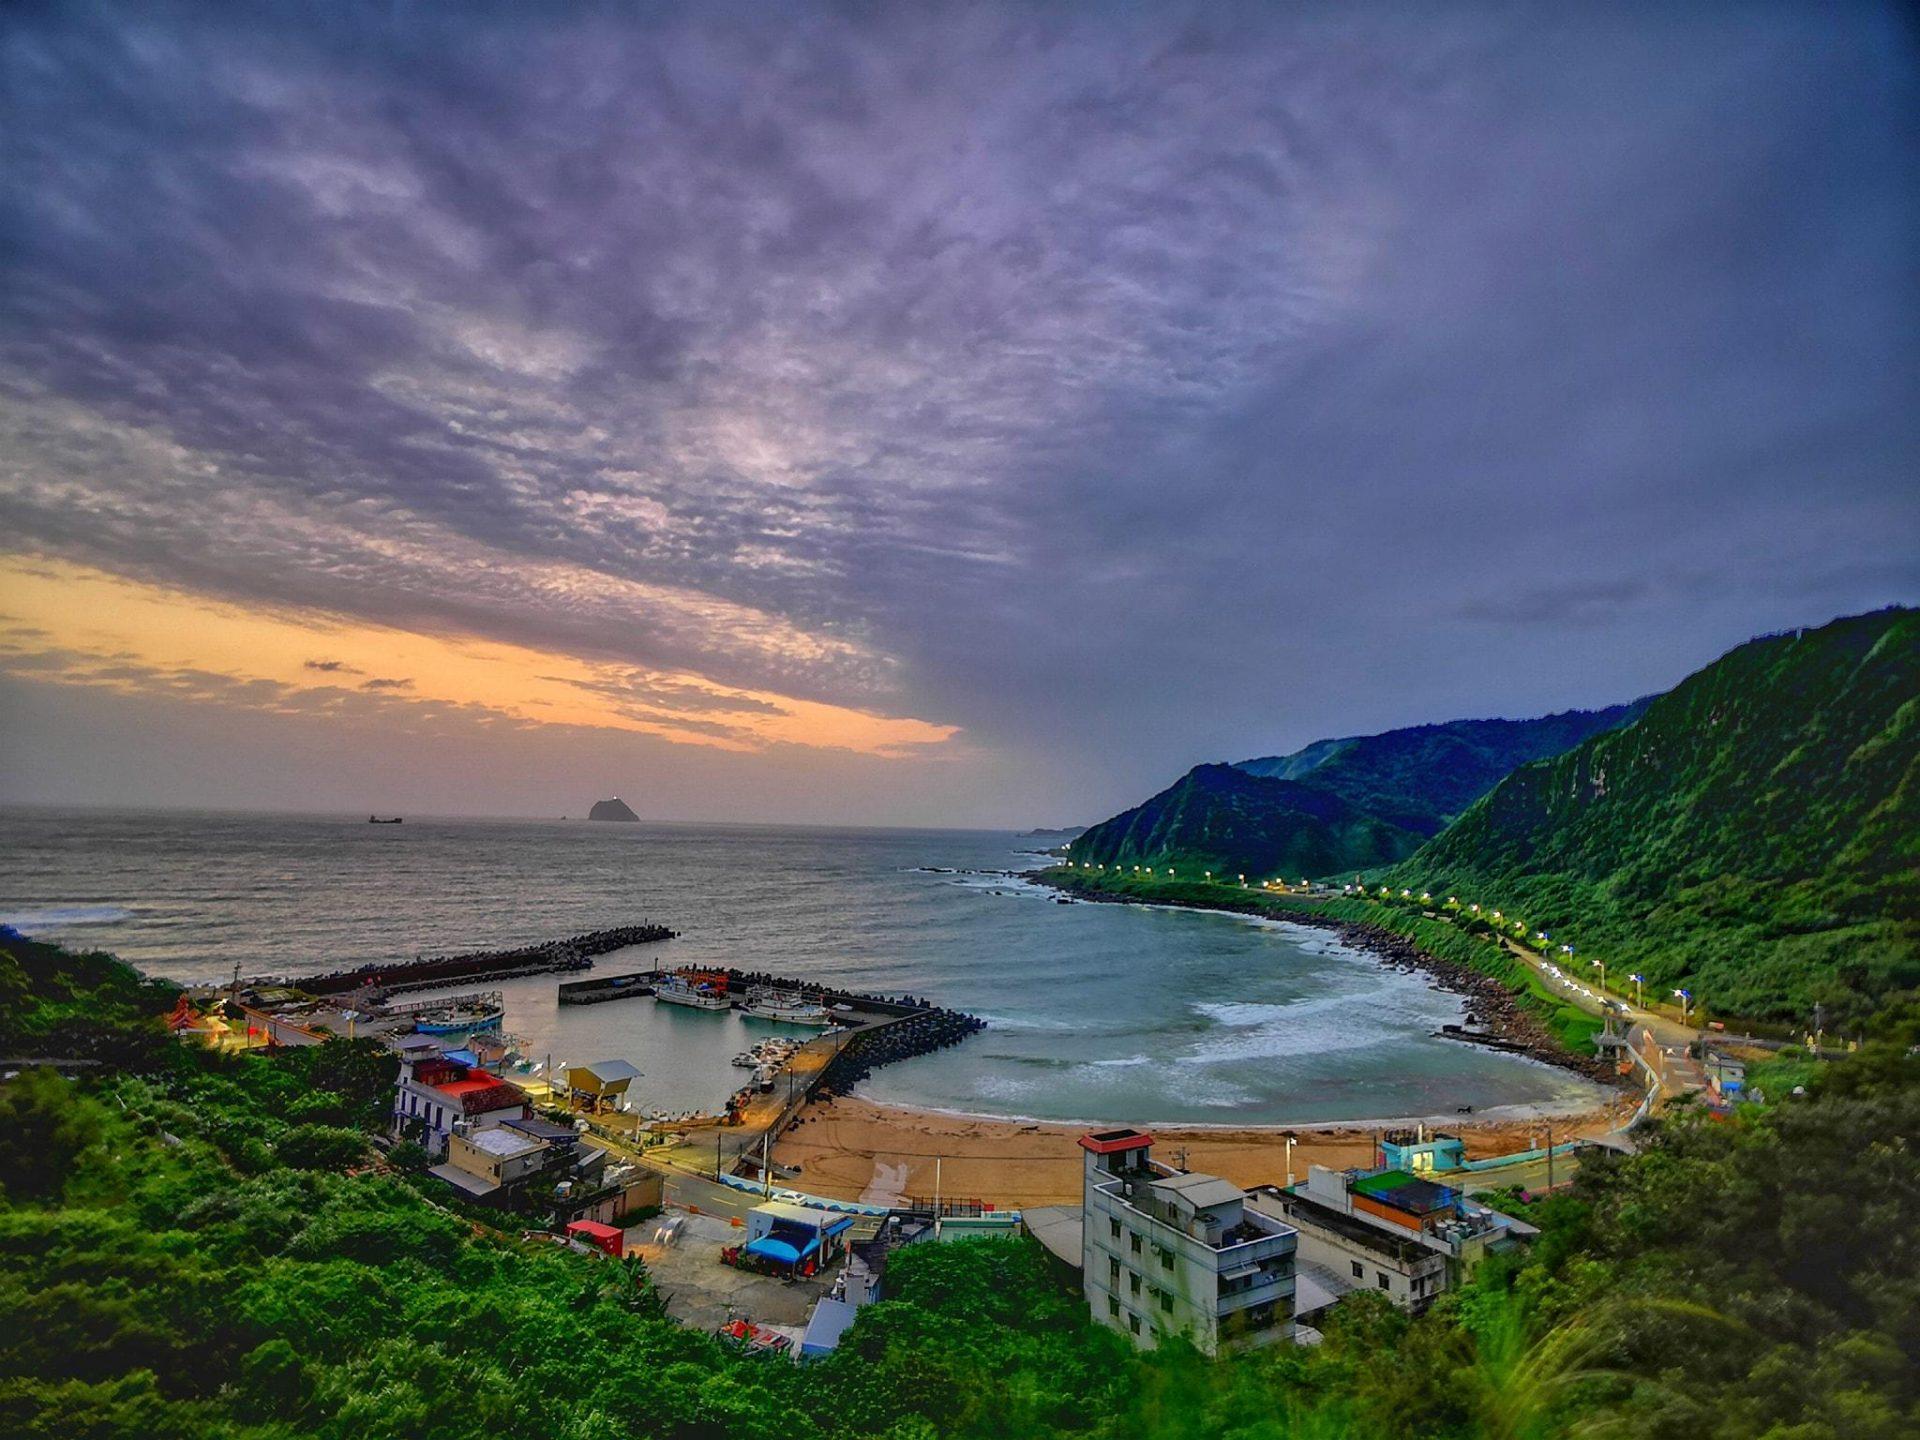 The Waimu Shan Seashore (外木山濱海步道) in Keelung City. (Image: Courtesy of Xing Mei/Keelung City)